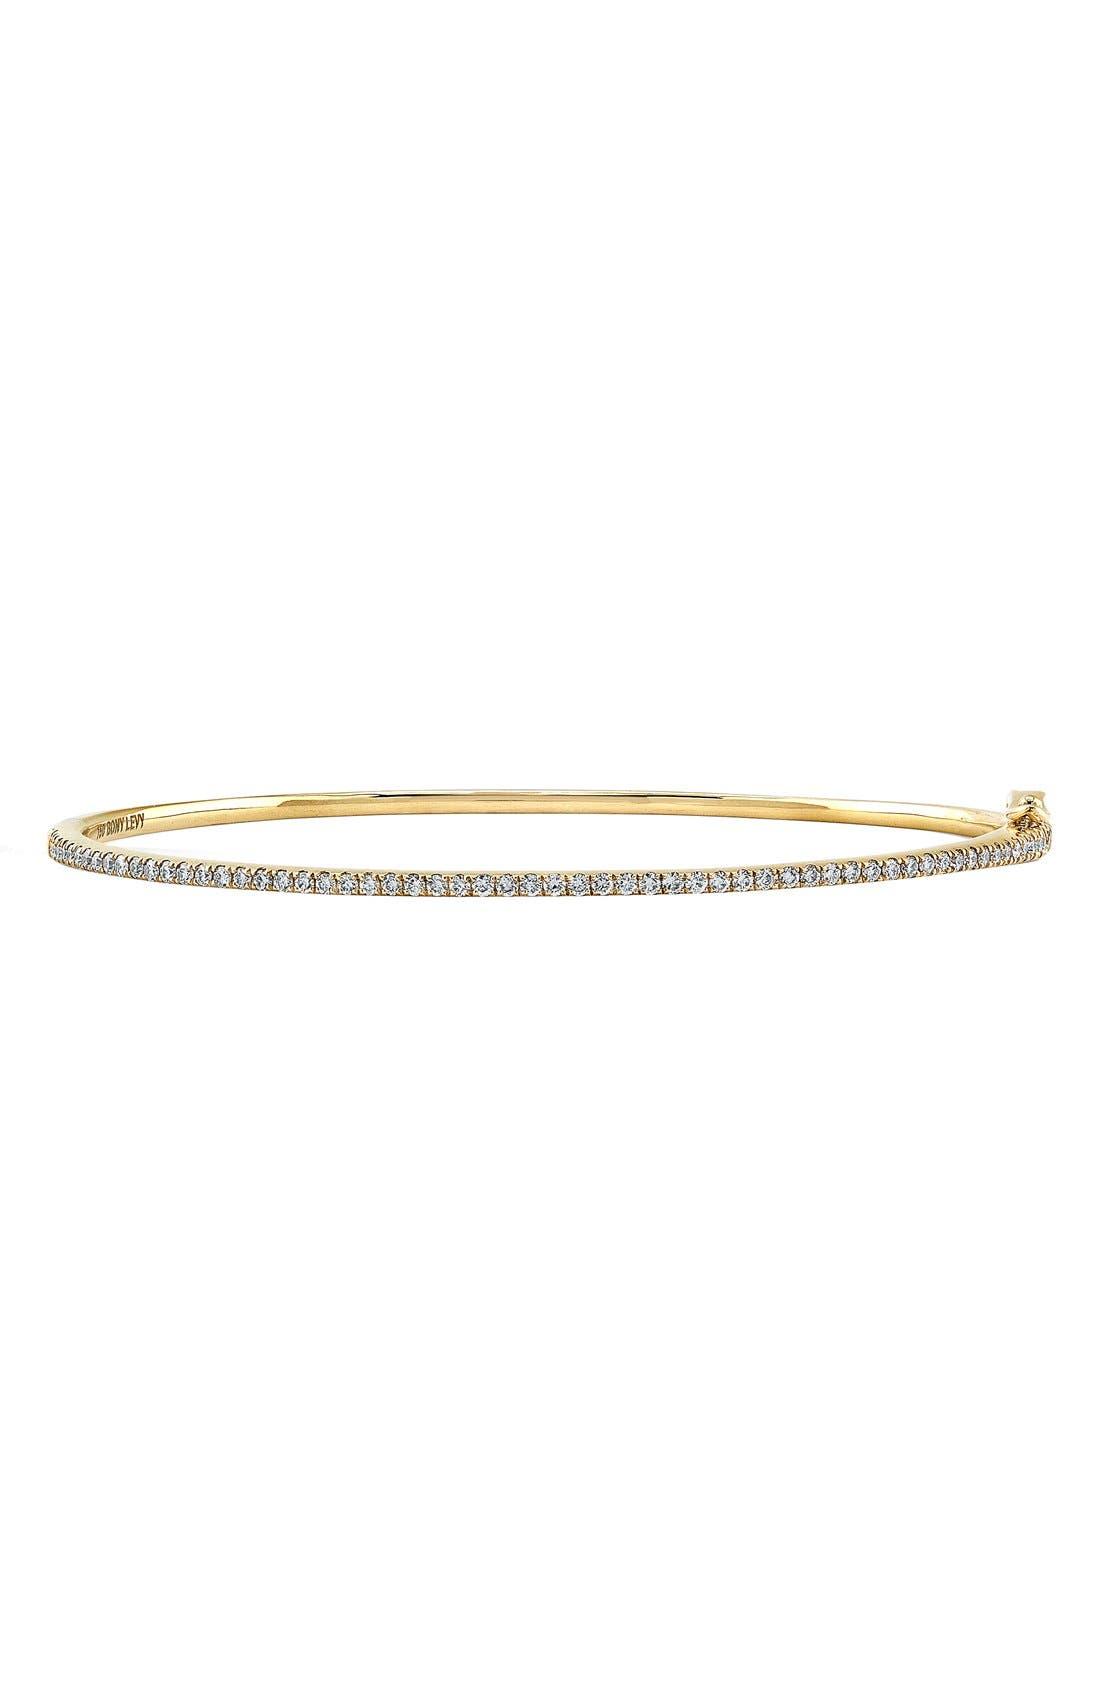 BONY LEVY Skinny Stackable Diamond Bangle, Main, color, YELLOW GOLD